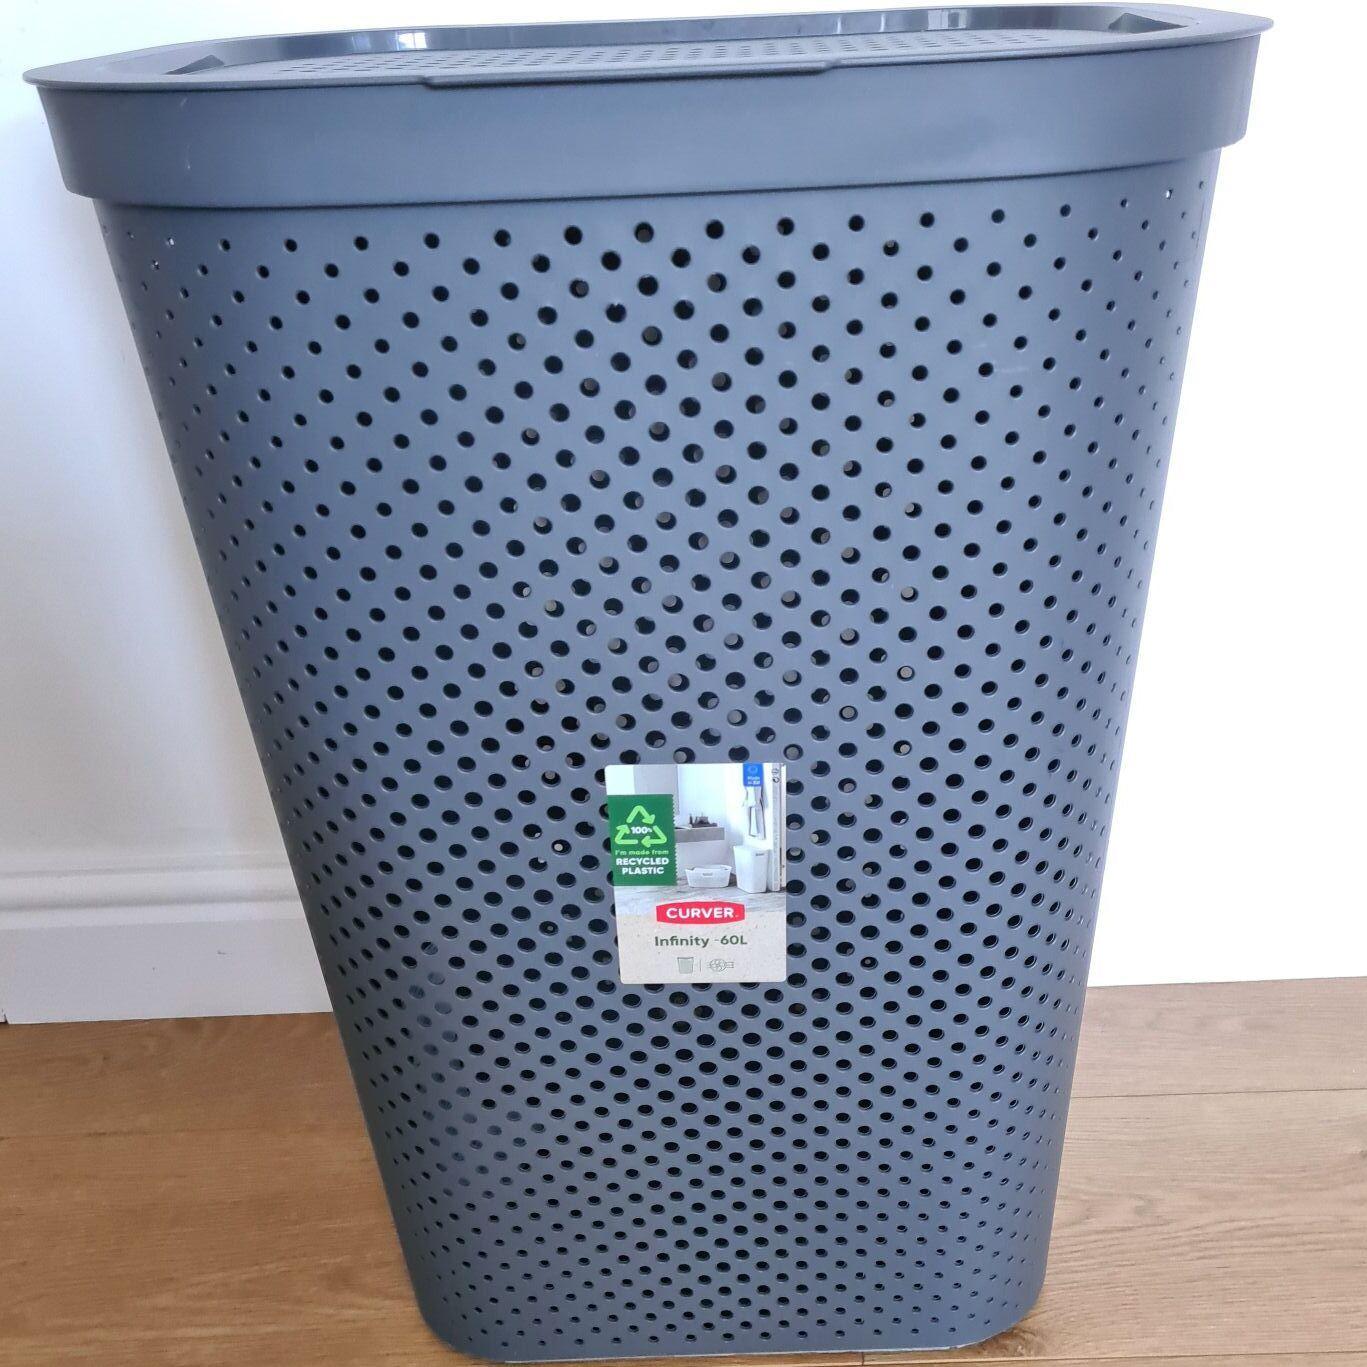 Curver infinity 60L laundry hamper £7.50 instore @ tesco crewe